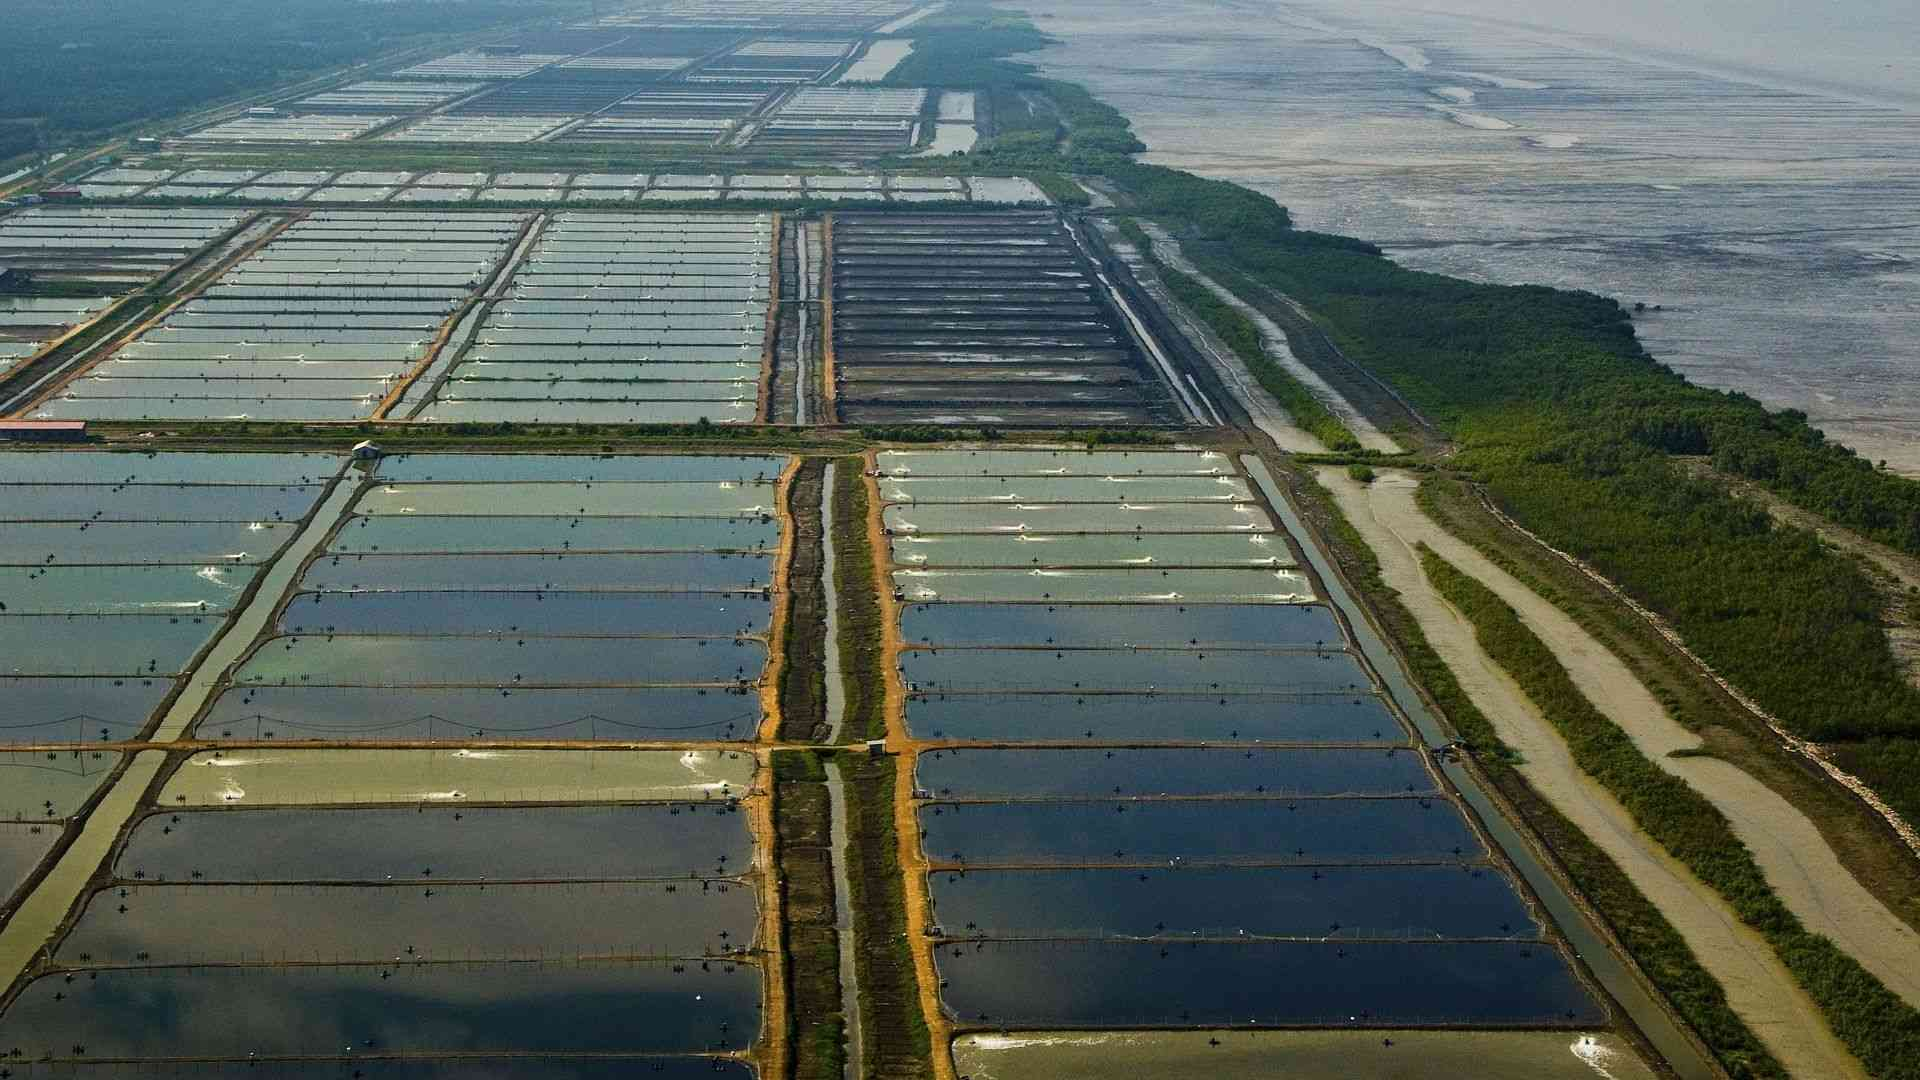 Fields near the western coast of the Malay Peninsula